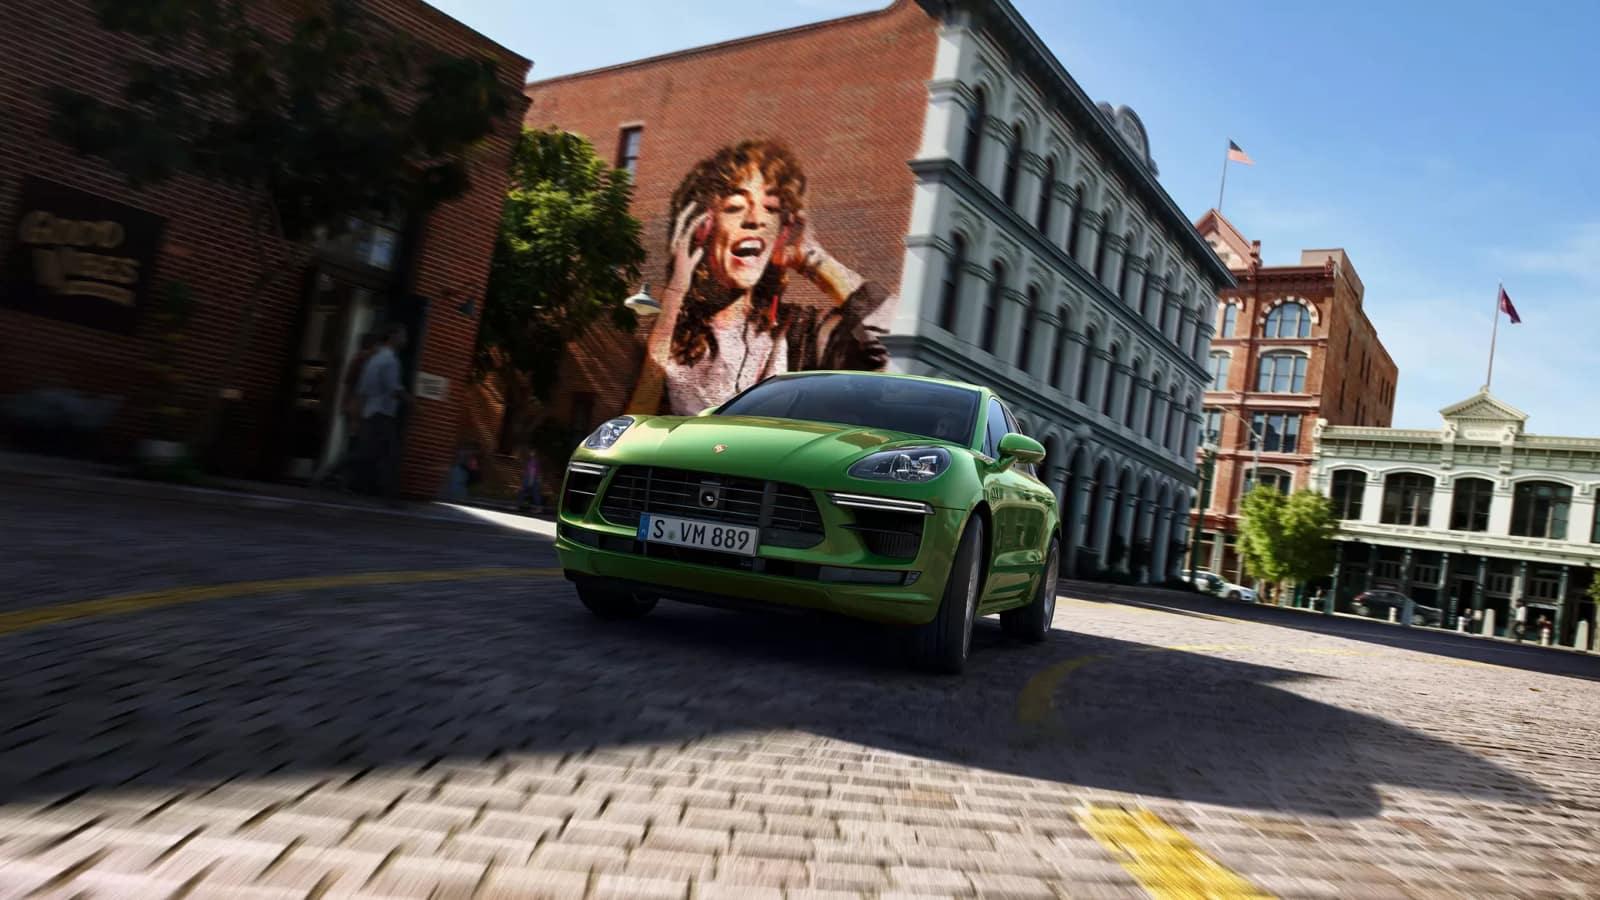 2020 Porsche Macan GTS For Sale In Los Angeles, CA